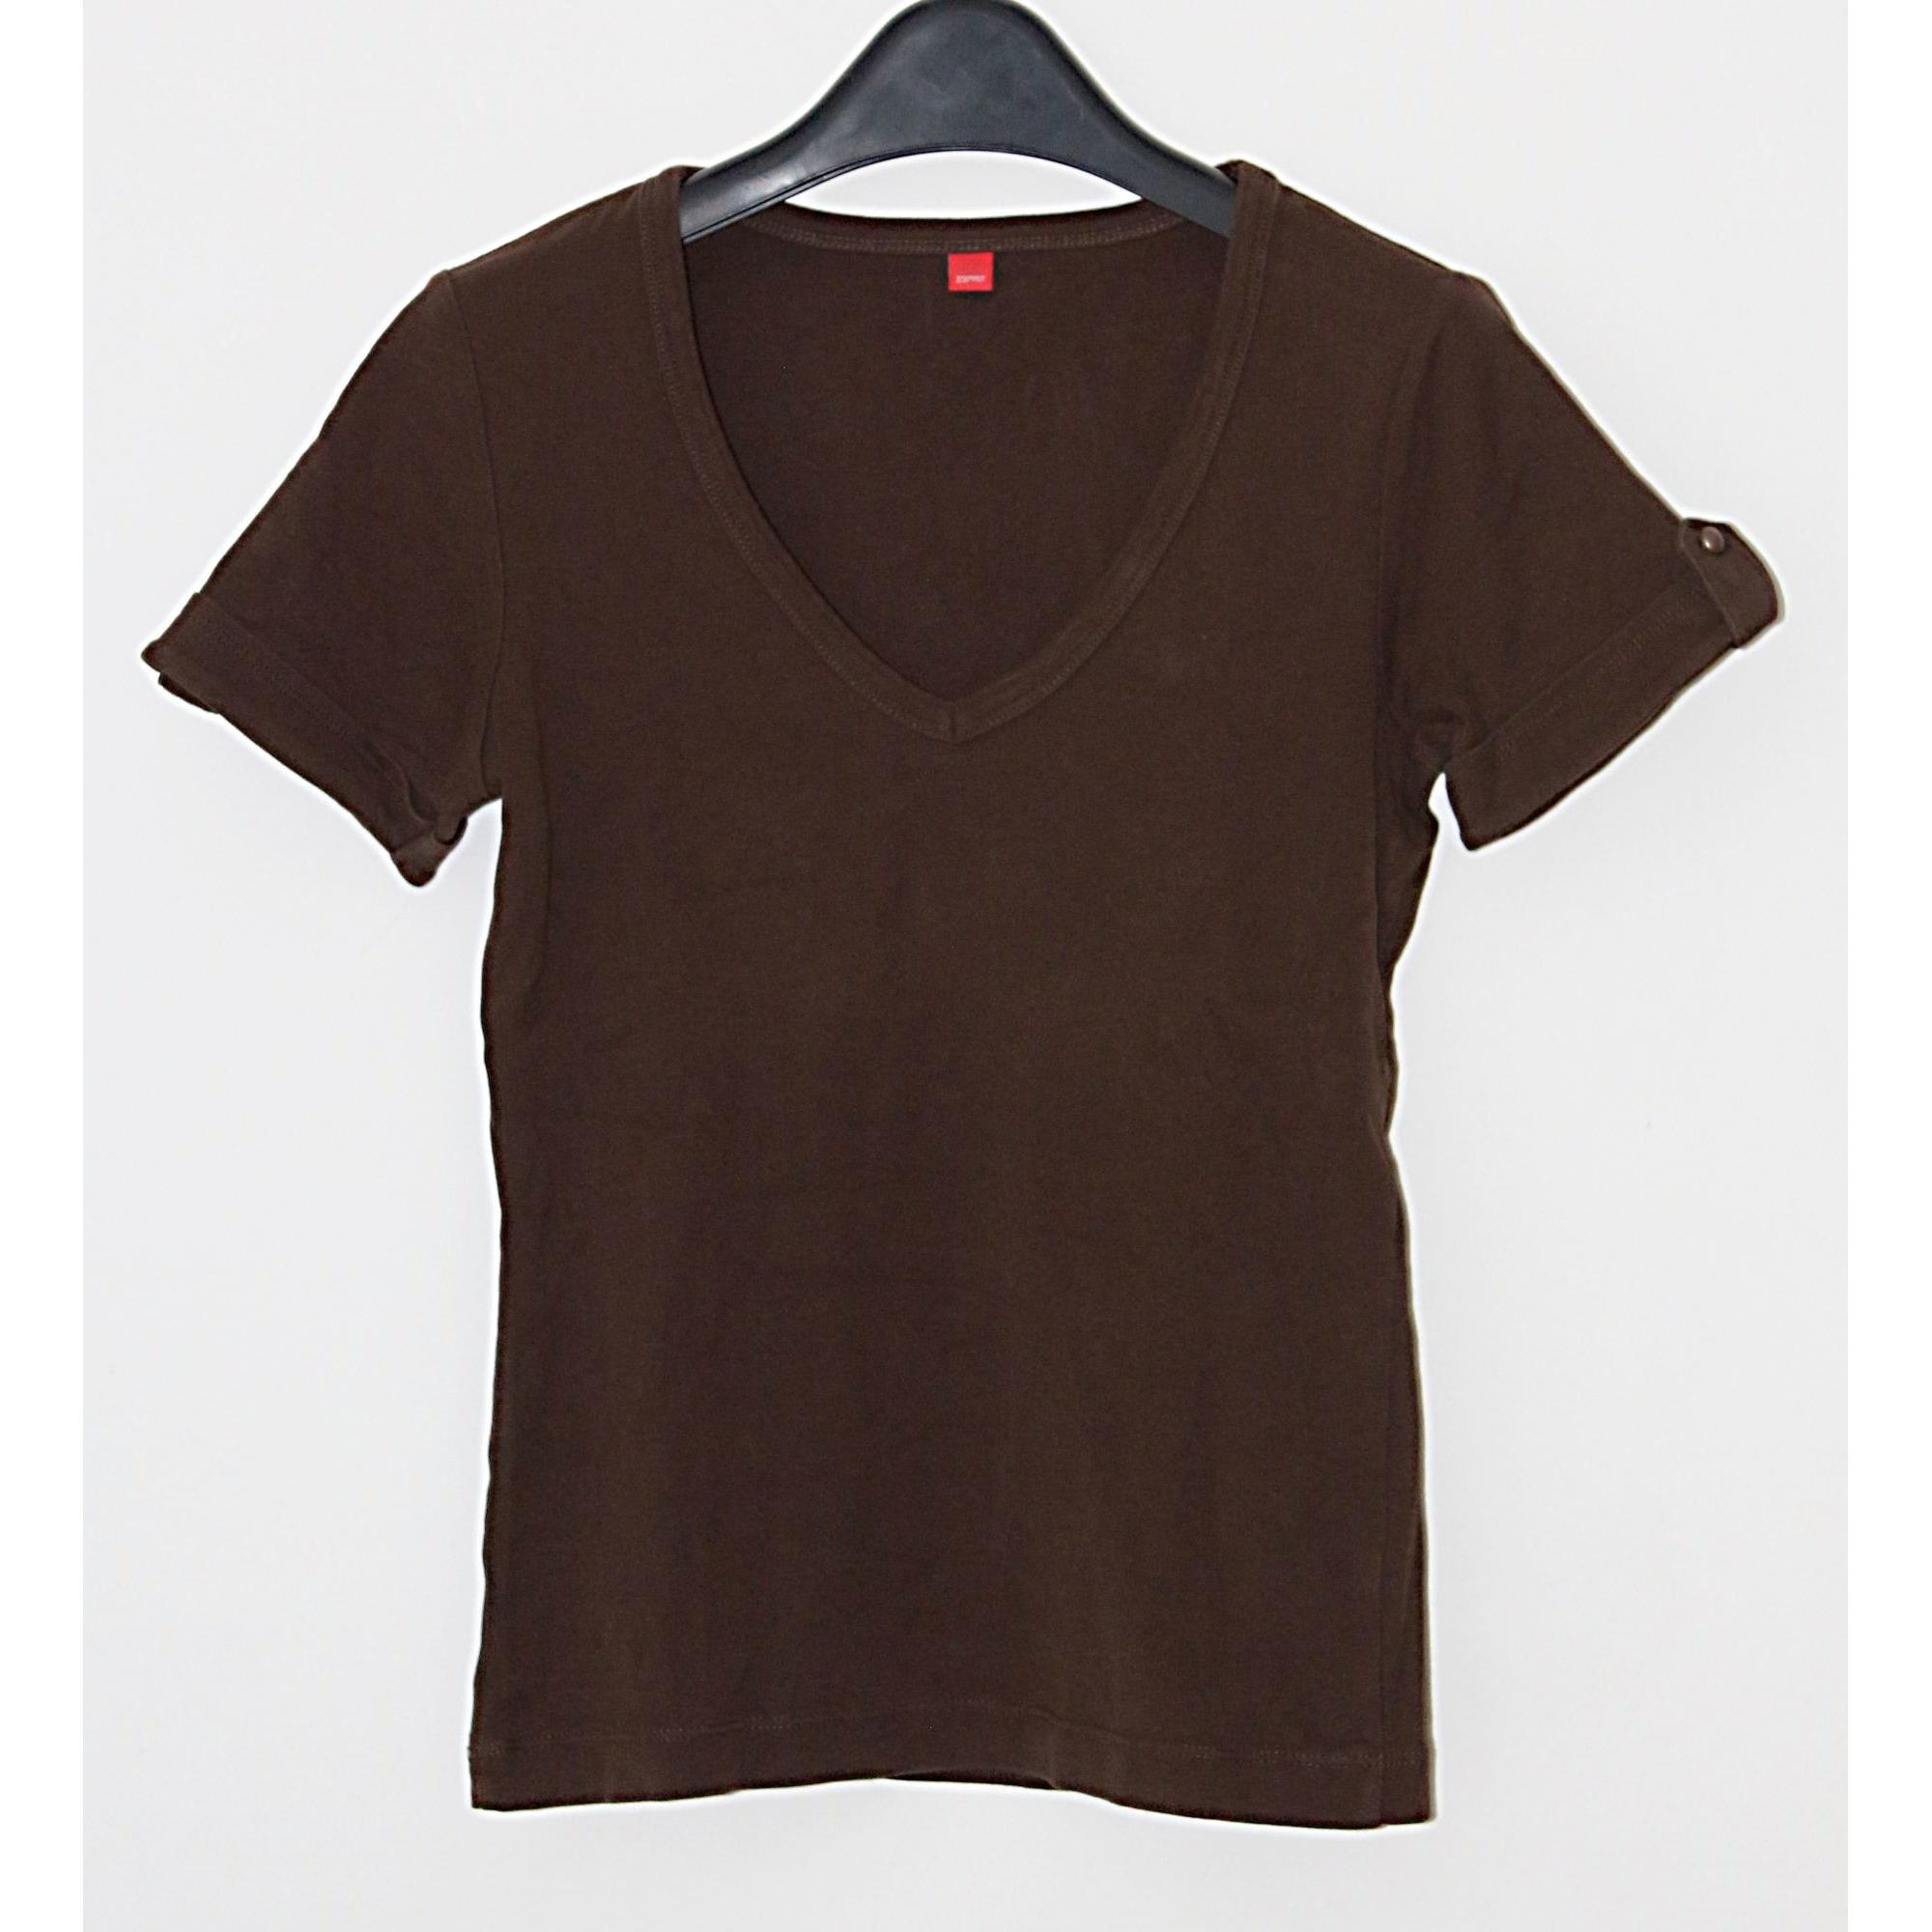 Top, tee-shirt ESPRIT Marron